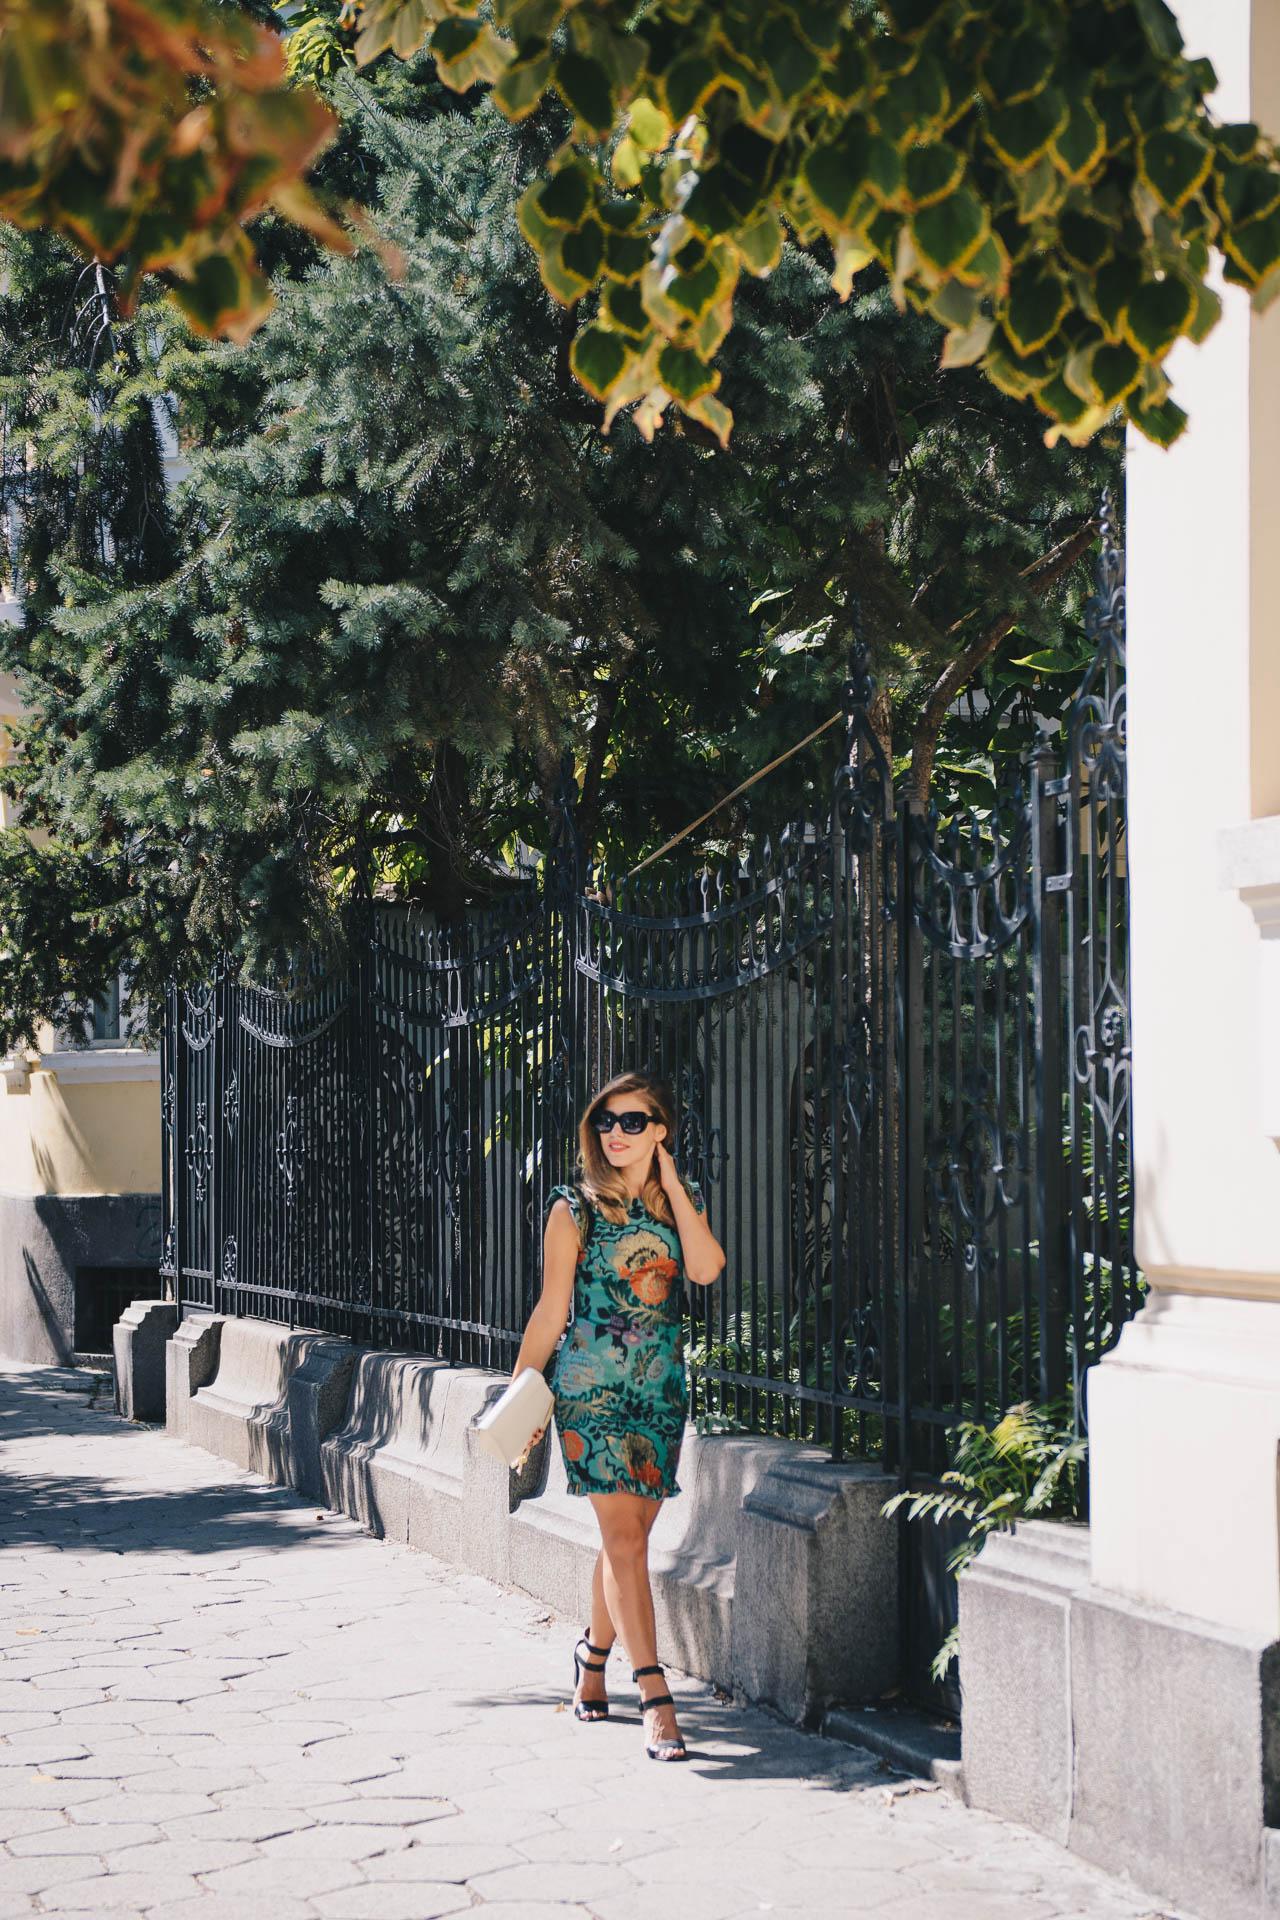 Autumn chic dress